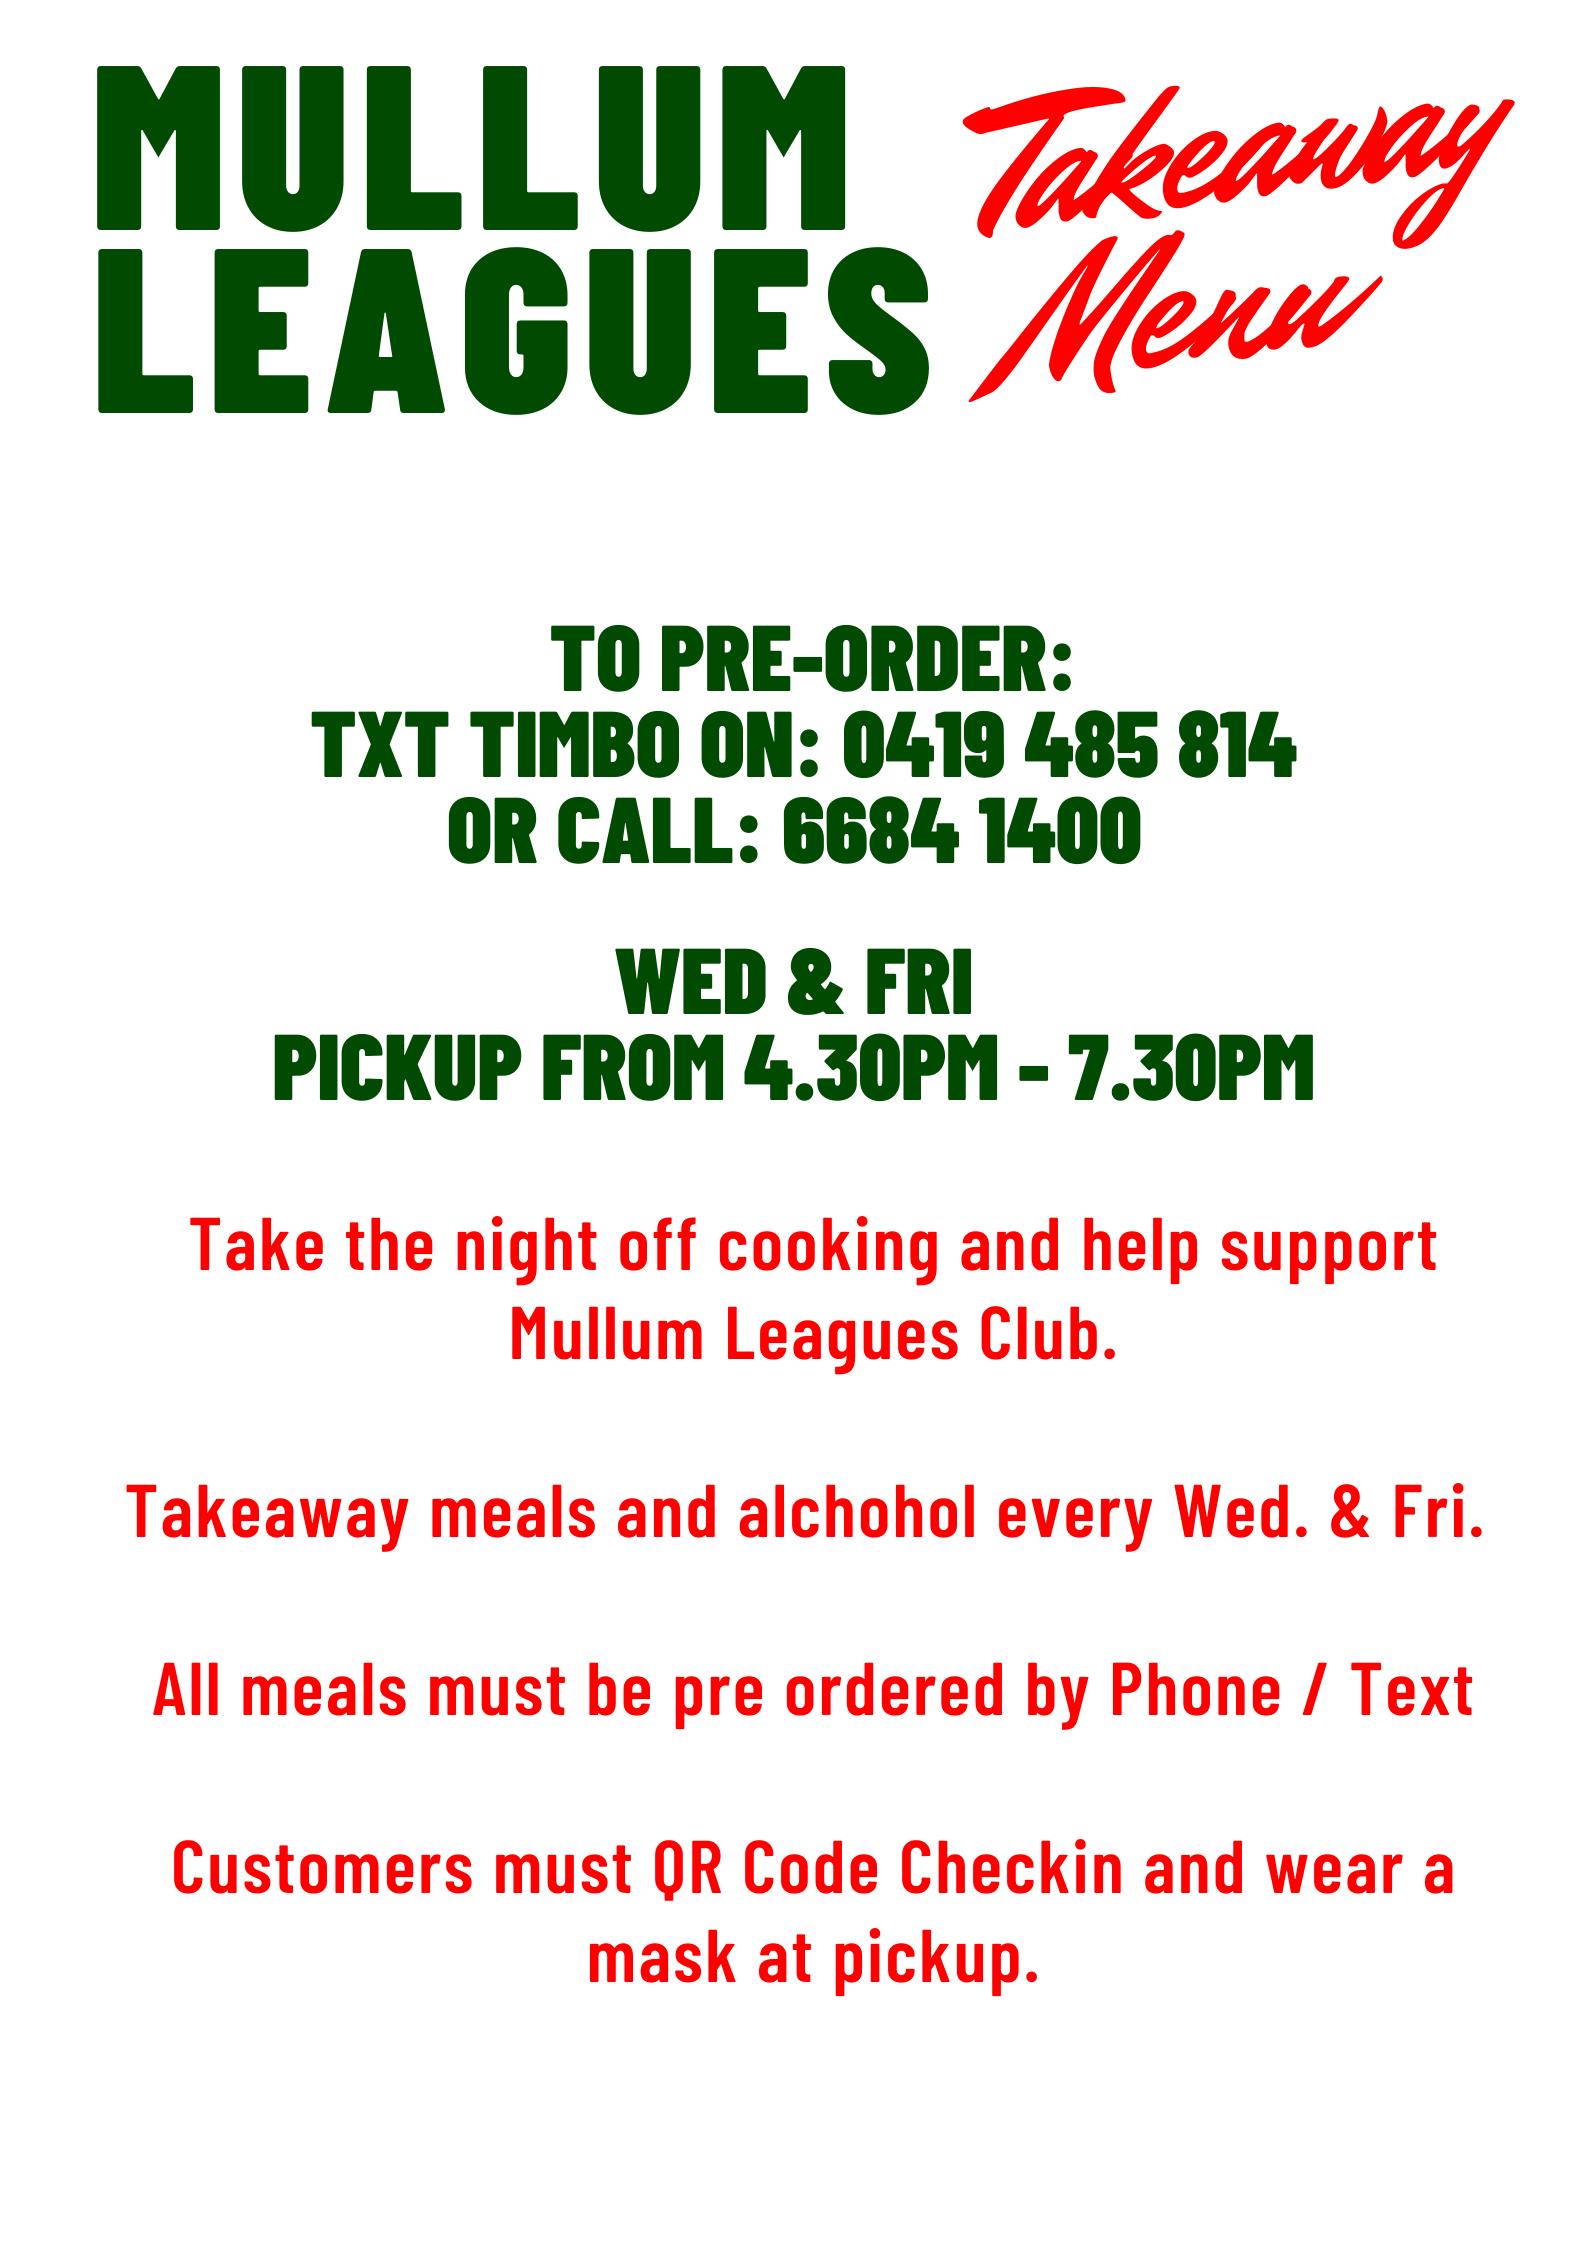 Wednesday Pasta Night Mullumbimby Takeaway Meals Menu, Leagues Club